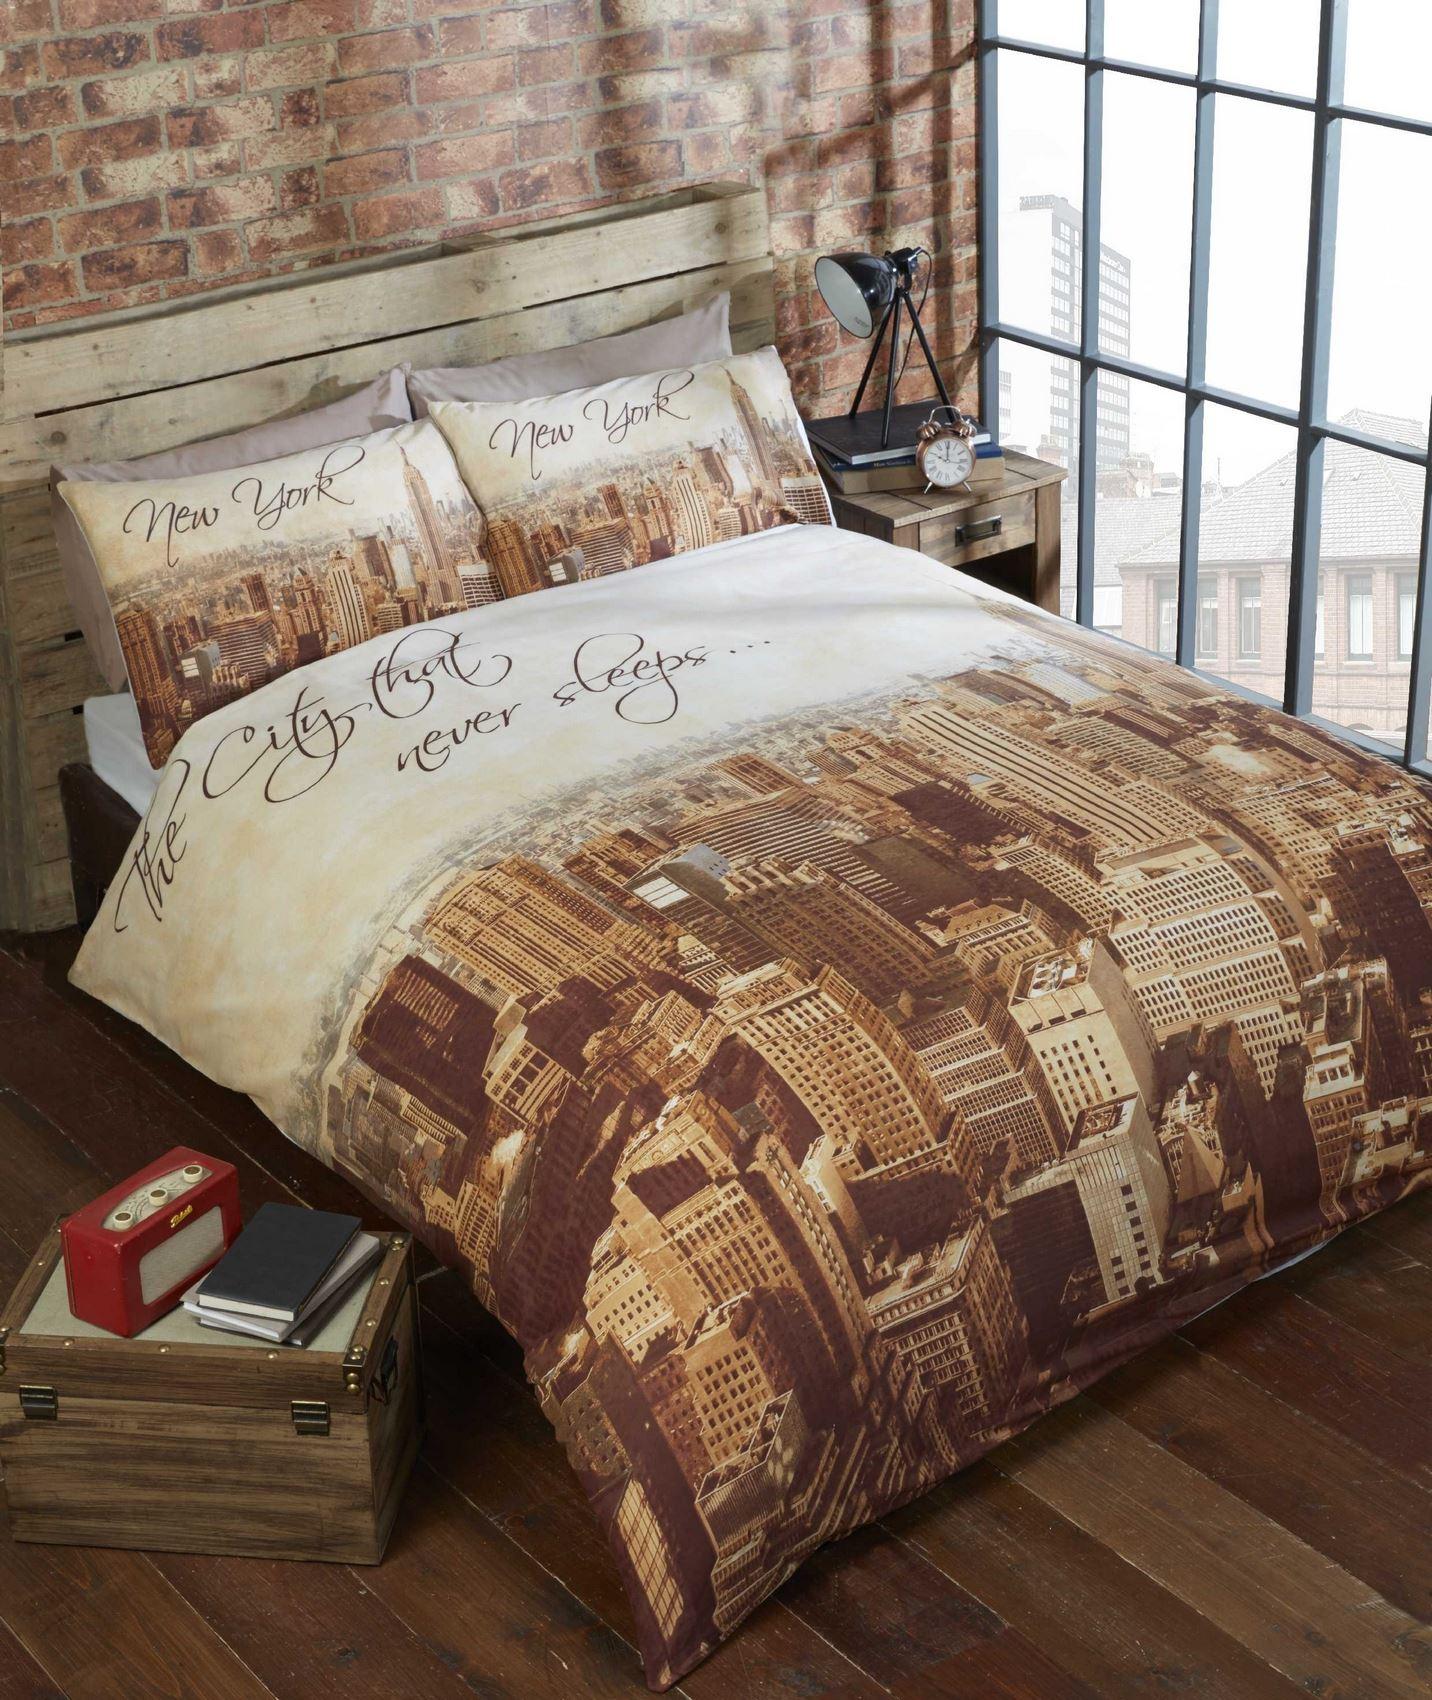 Lyckoax Duvet Cover And Pillowcase S White Lilac: Modern Duvet Cover & Pillowcase Bedding Bed Set Urban